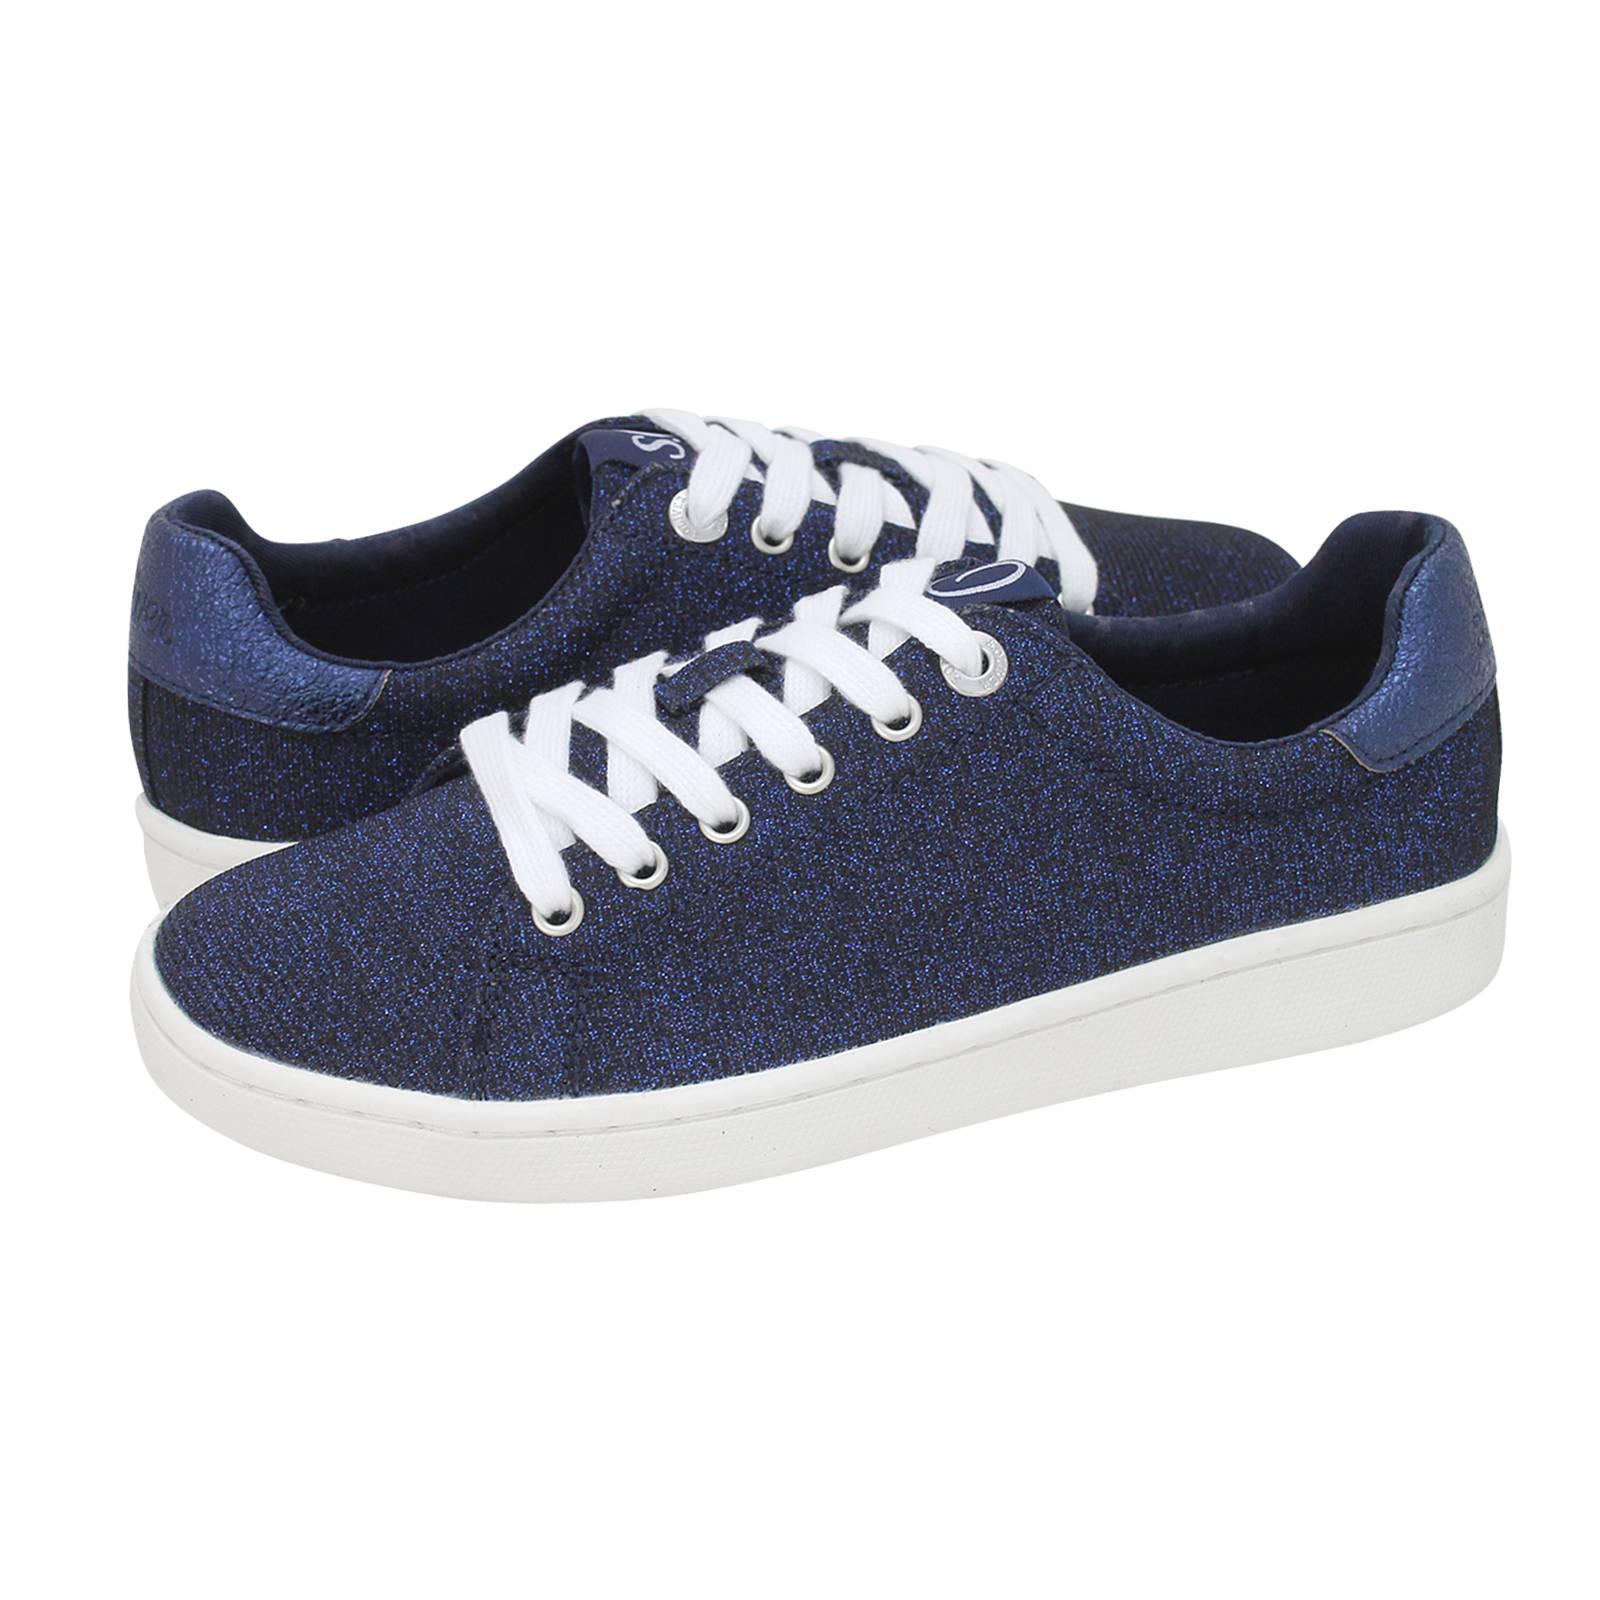 Clark - Γυναικεία παπούτσια casual s.Oliver από ύφασμα και δέρμα ... 6b3b7d856bf